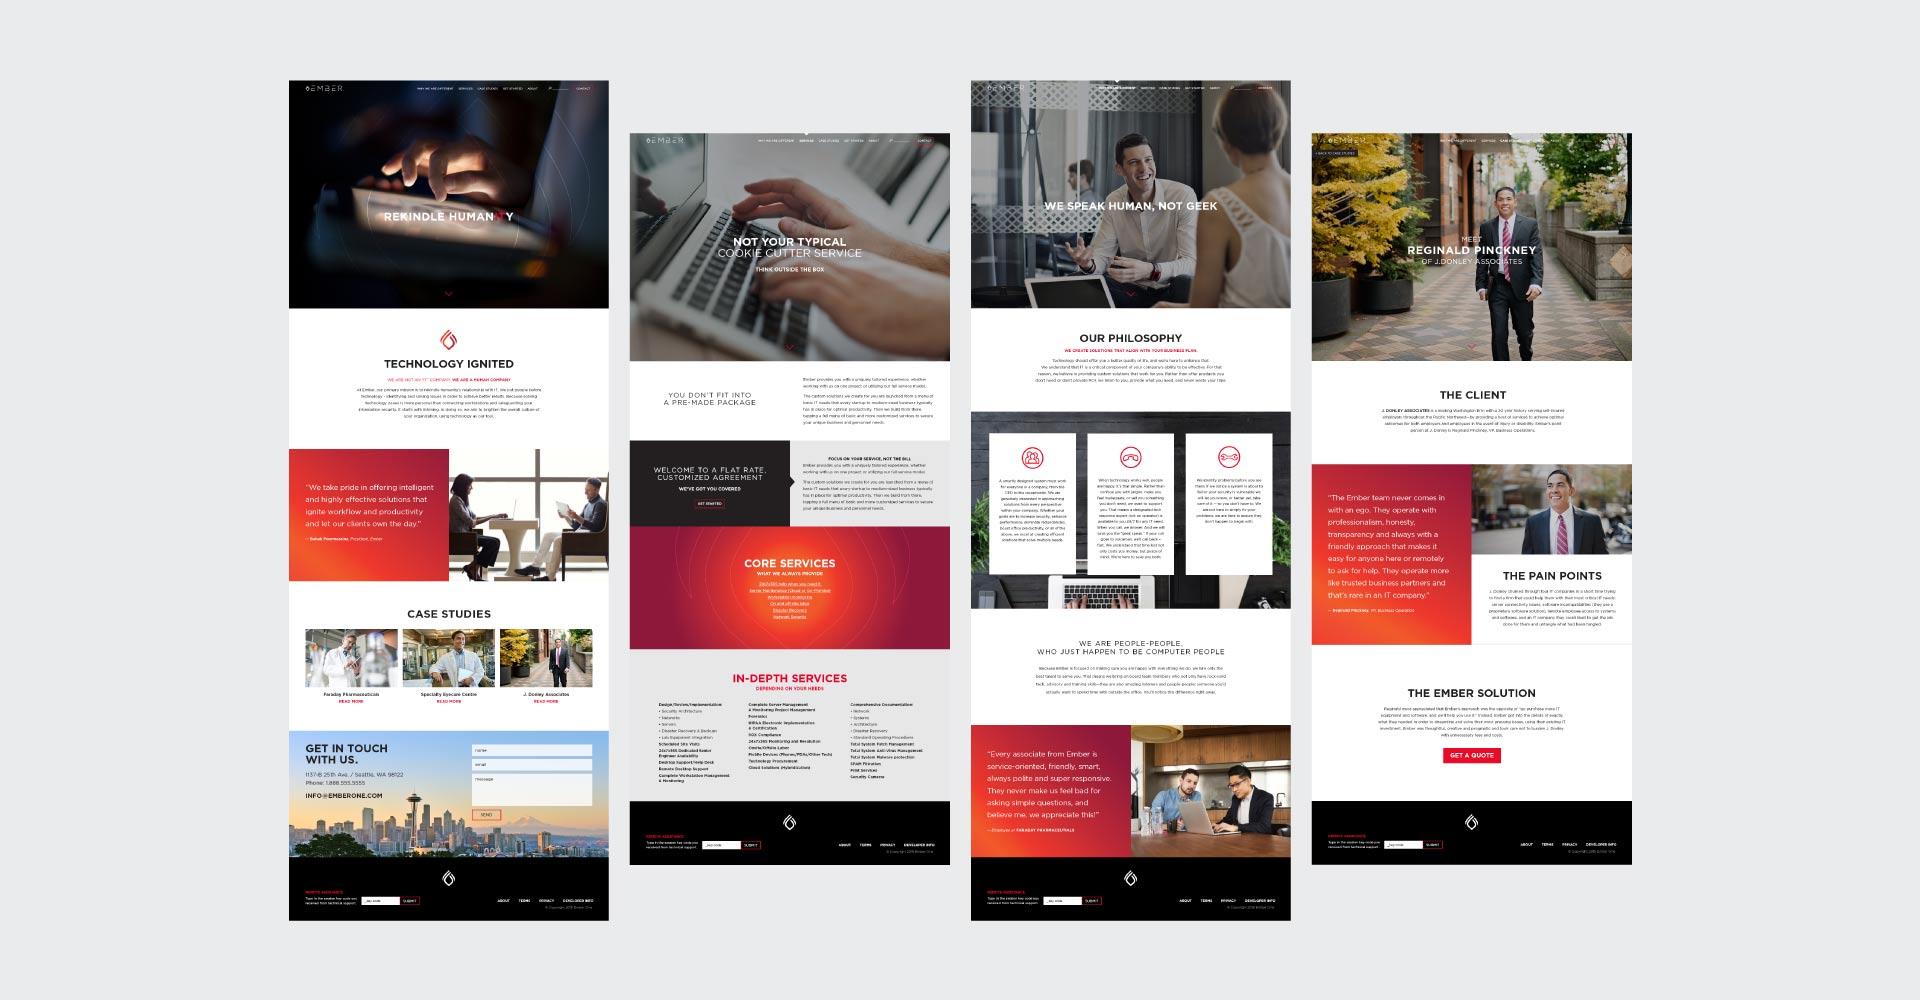 Creative_Retail_Packaging_Branding_Identity_Web_Design_Ember_03-1.jpg